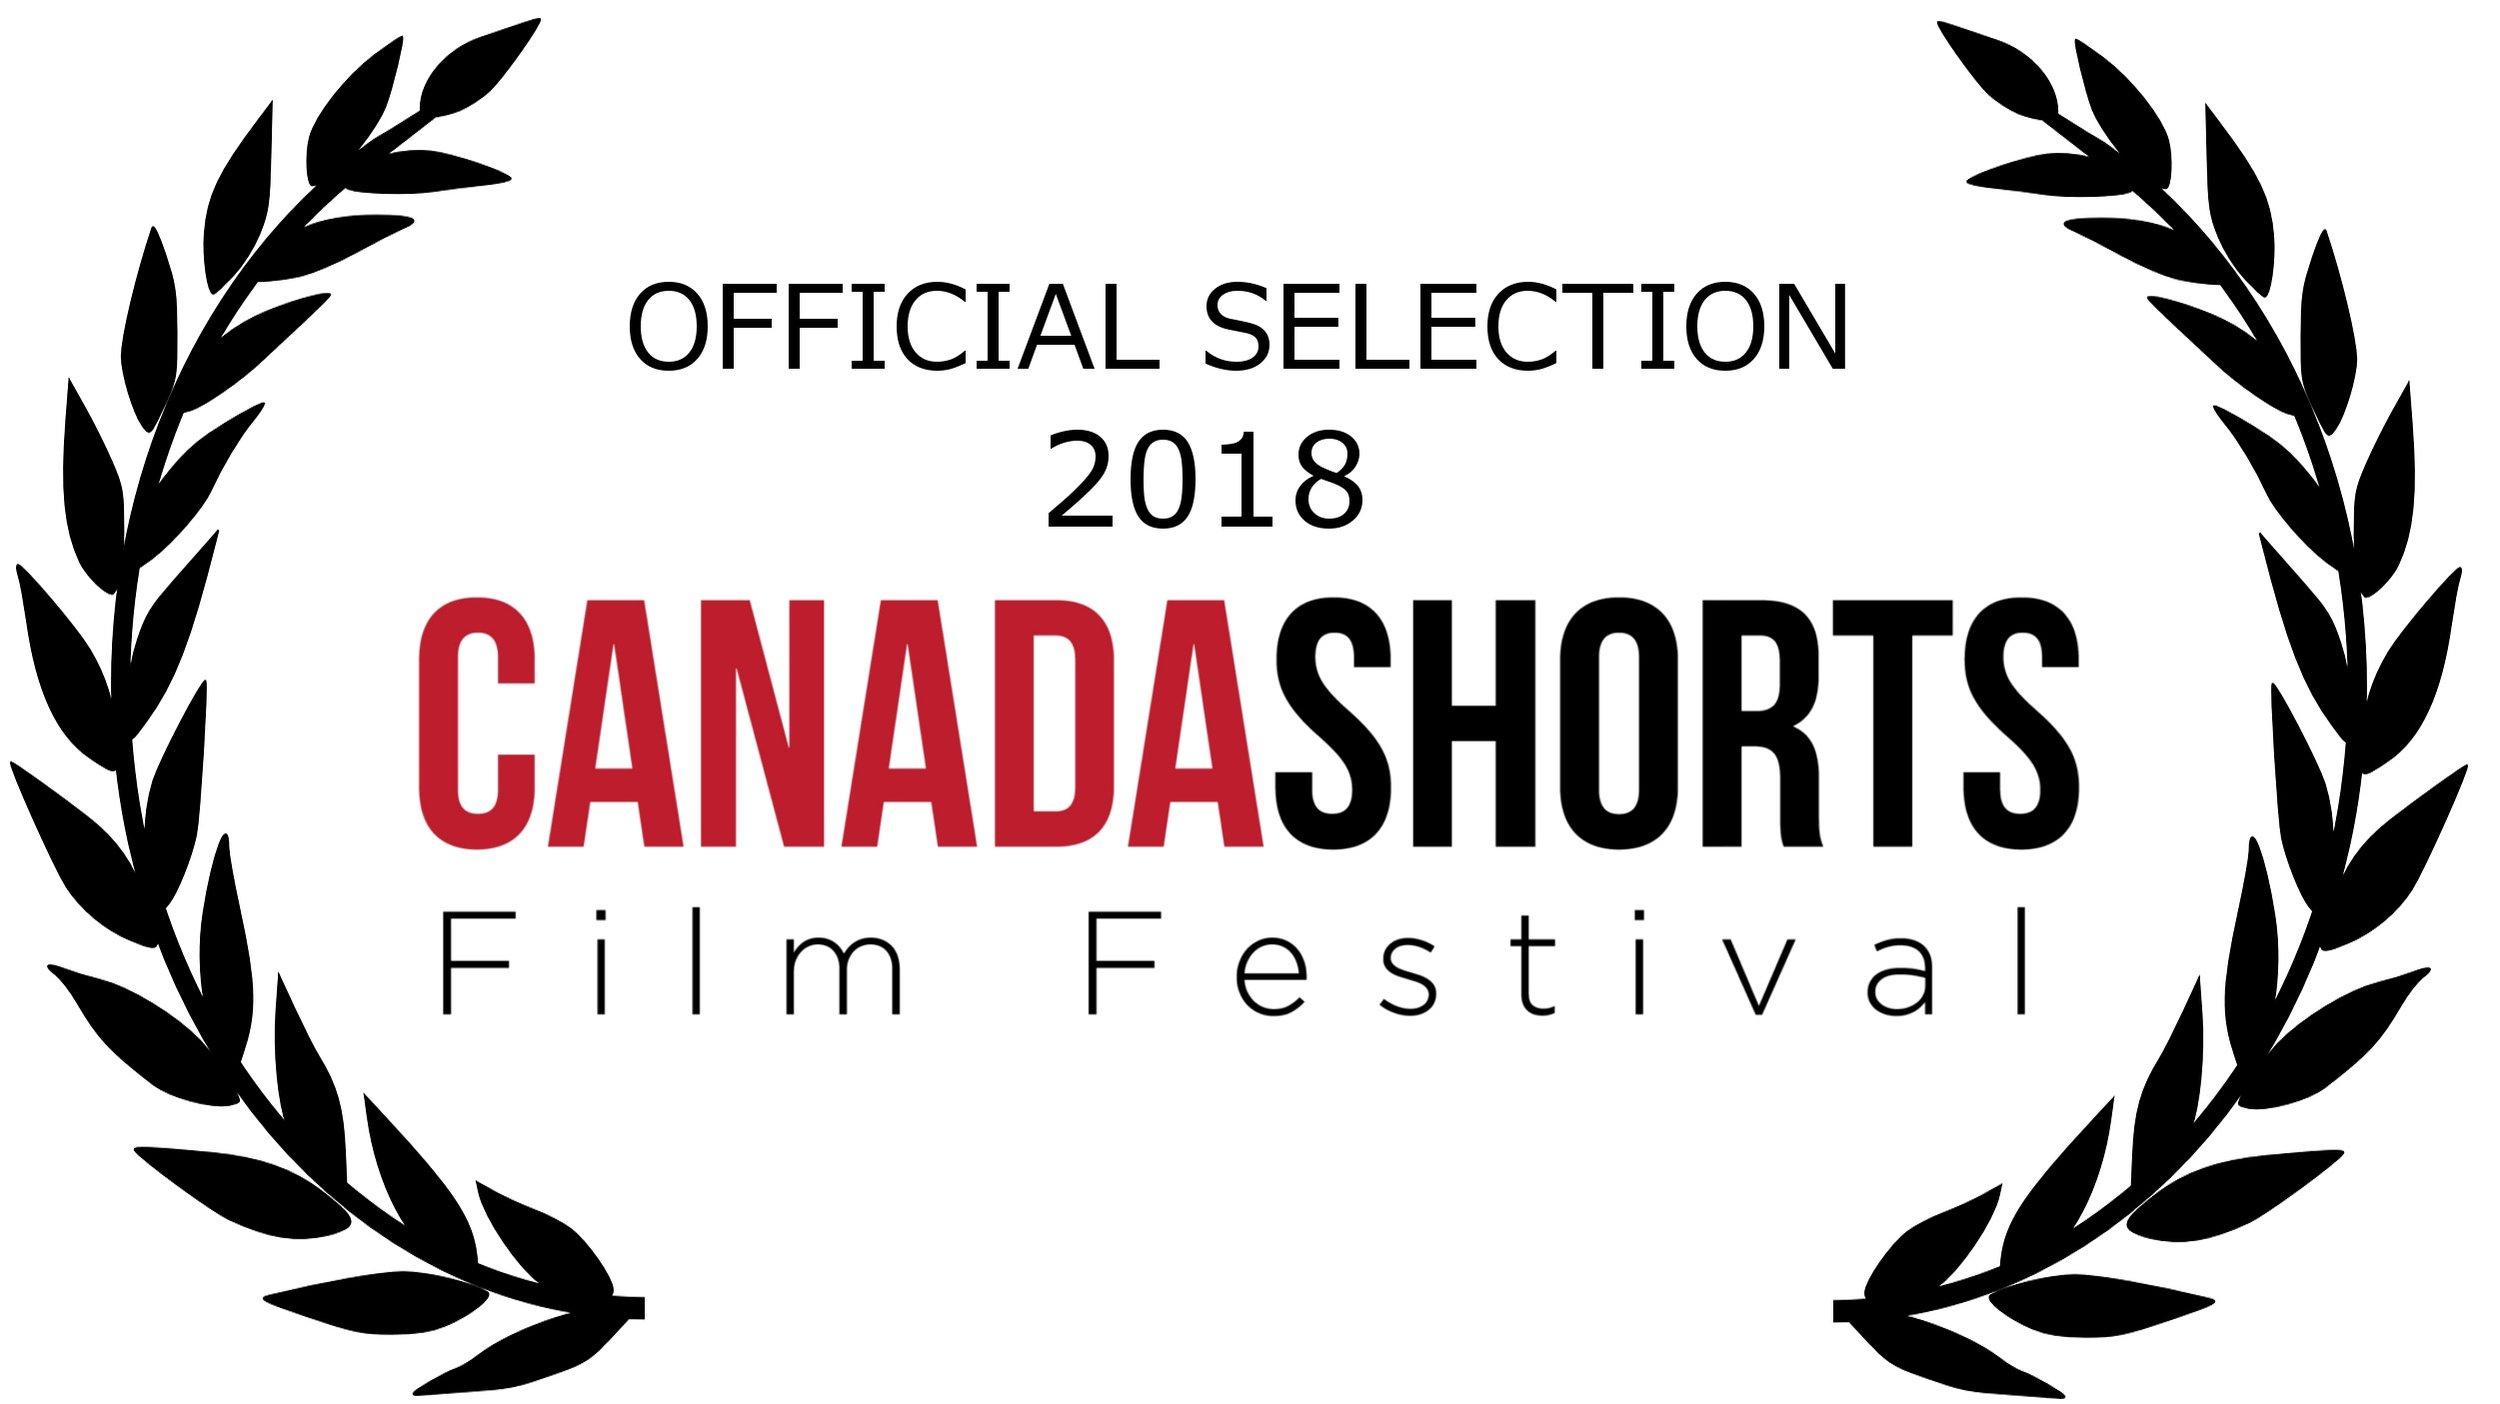 Canada Shorts official selection laurel - black copy.jpg